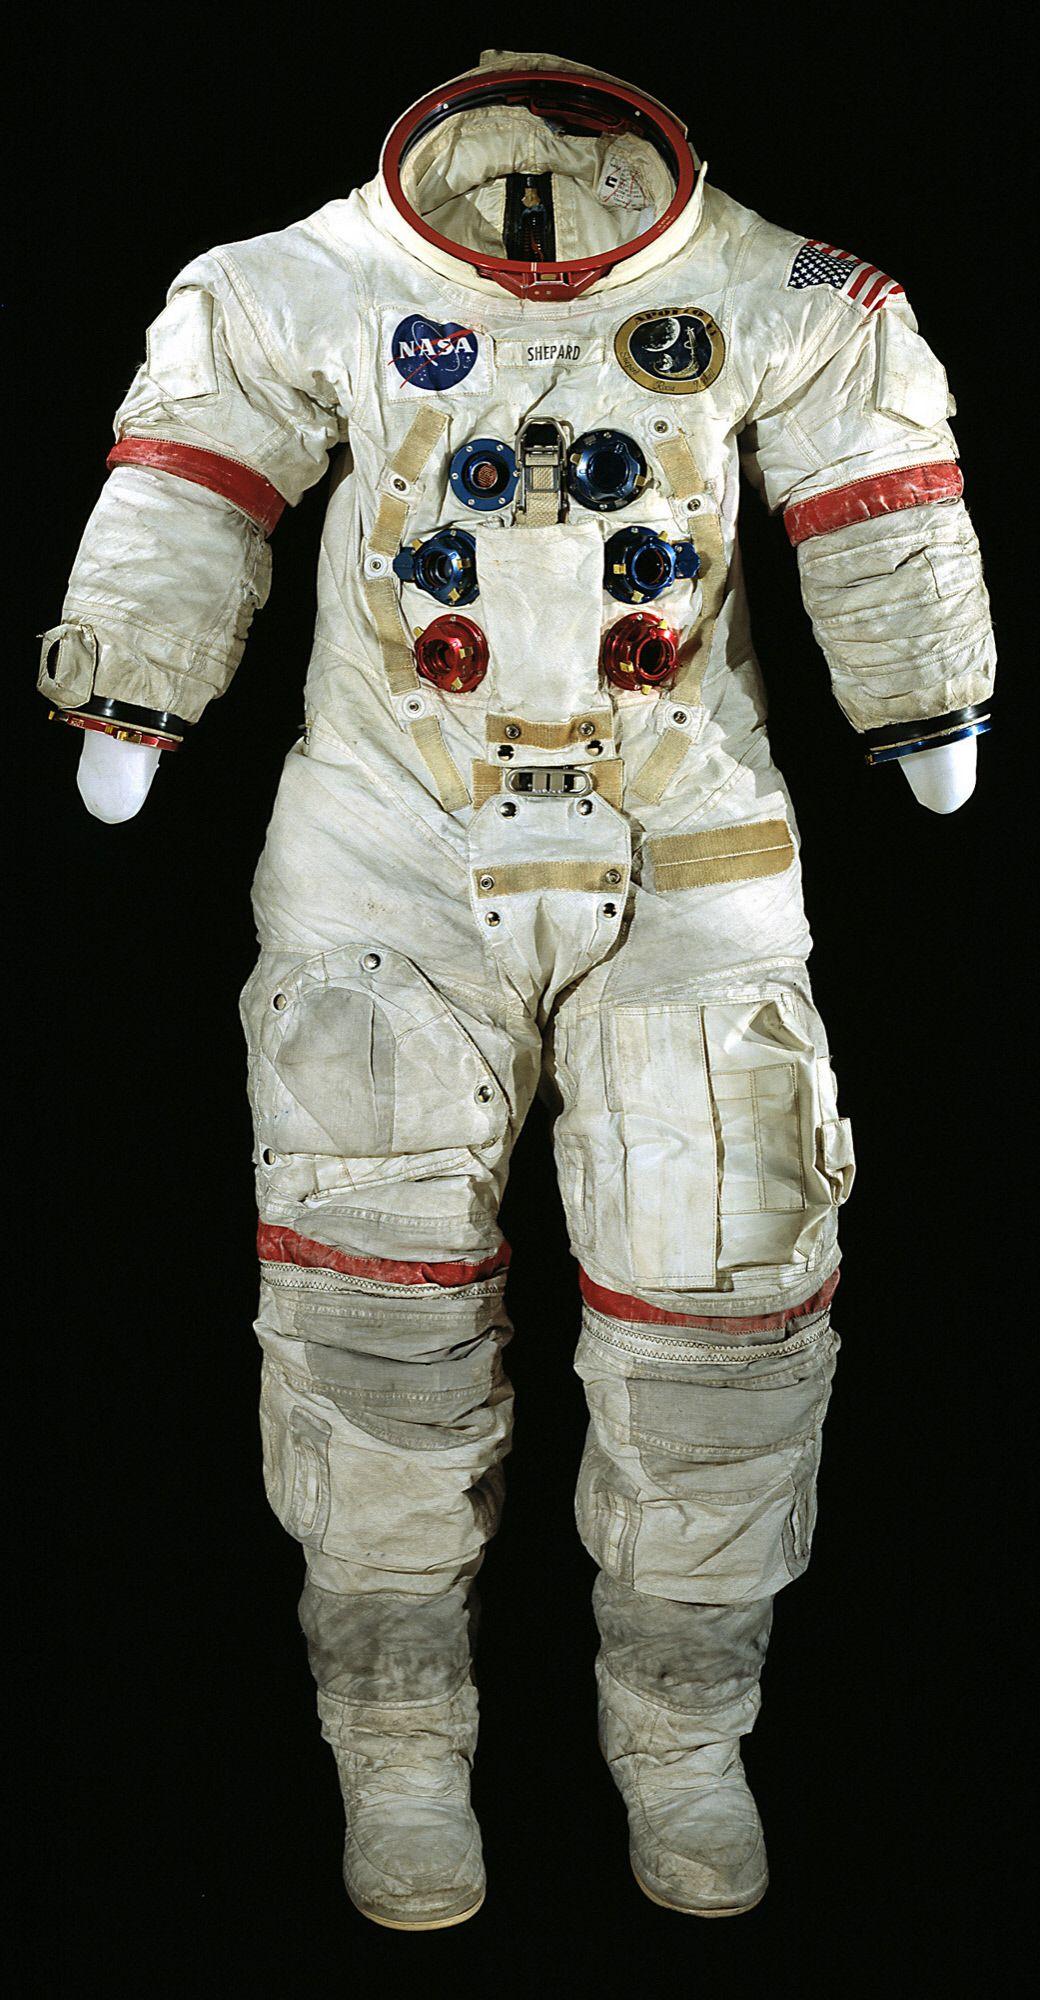 apollo 13 space suit - photo #9